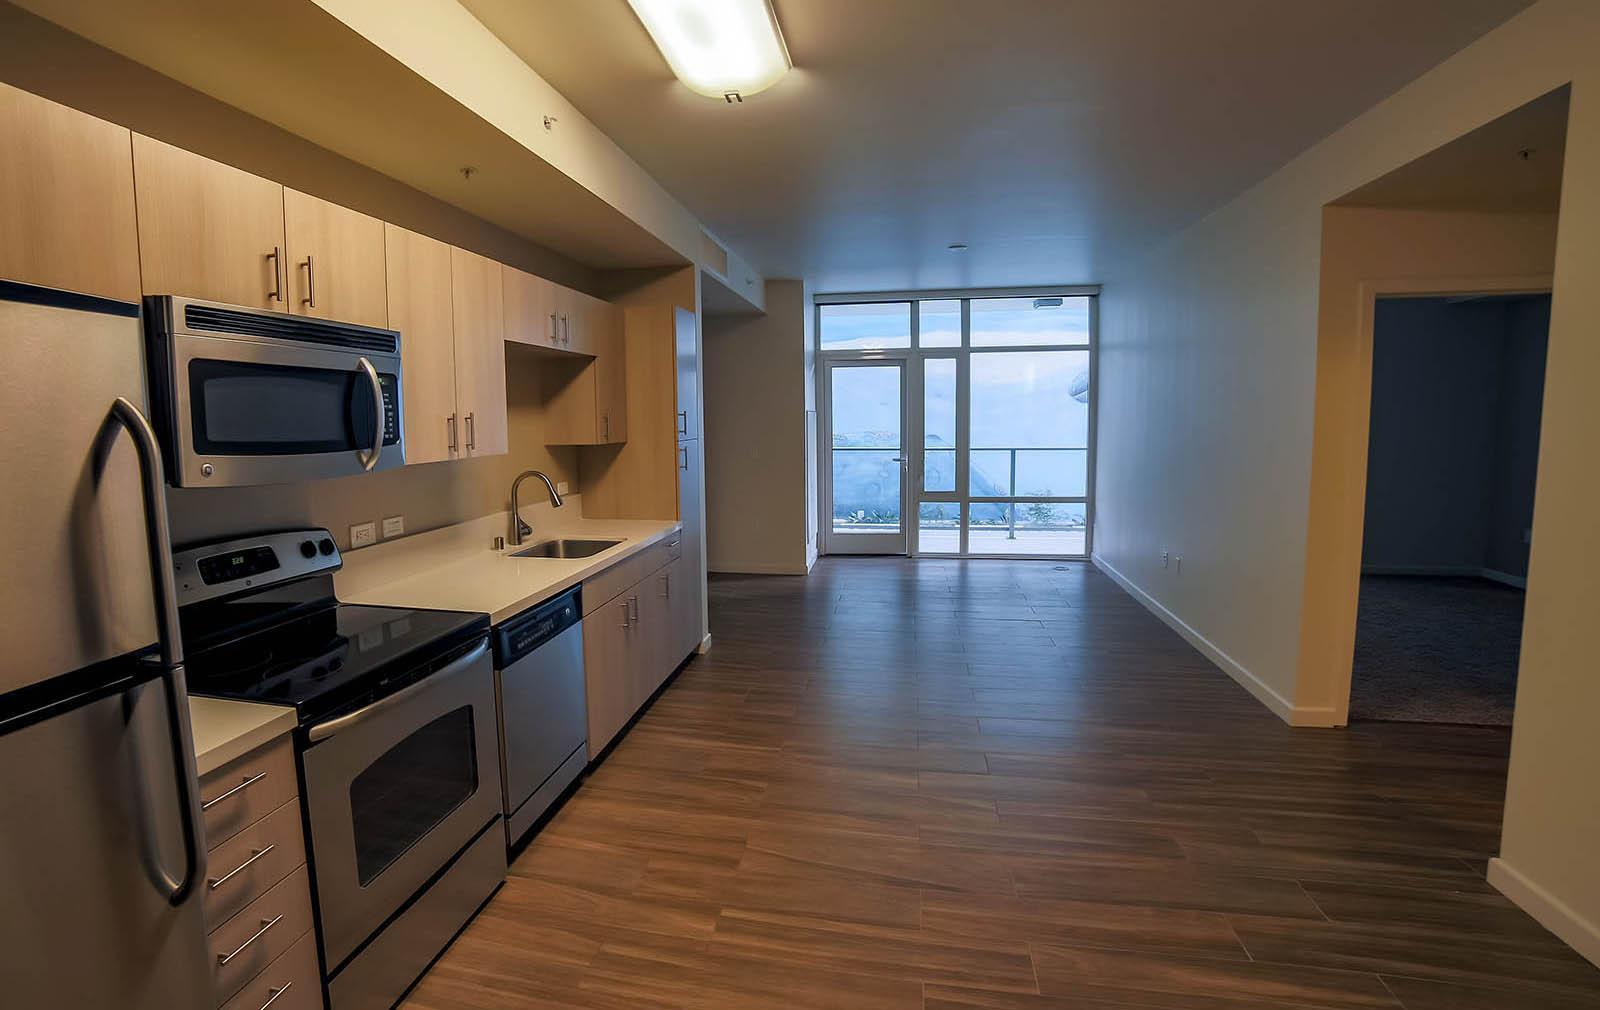 701 W Beech Street #FP - 1BR/1BA, San Diego, CA - 2,295 USD/ month